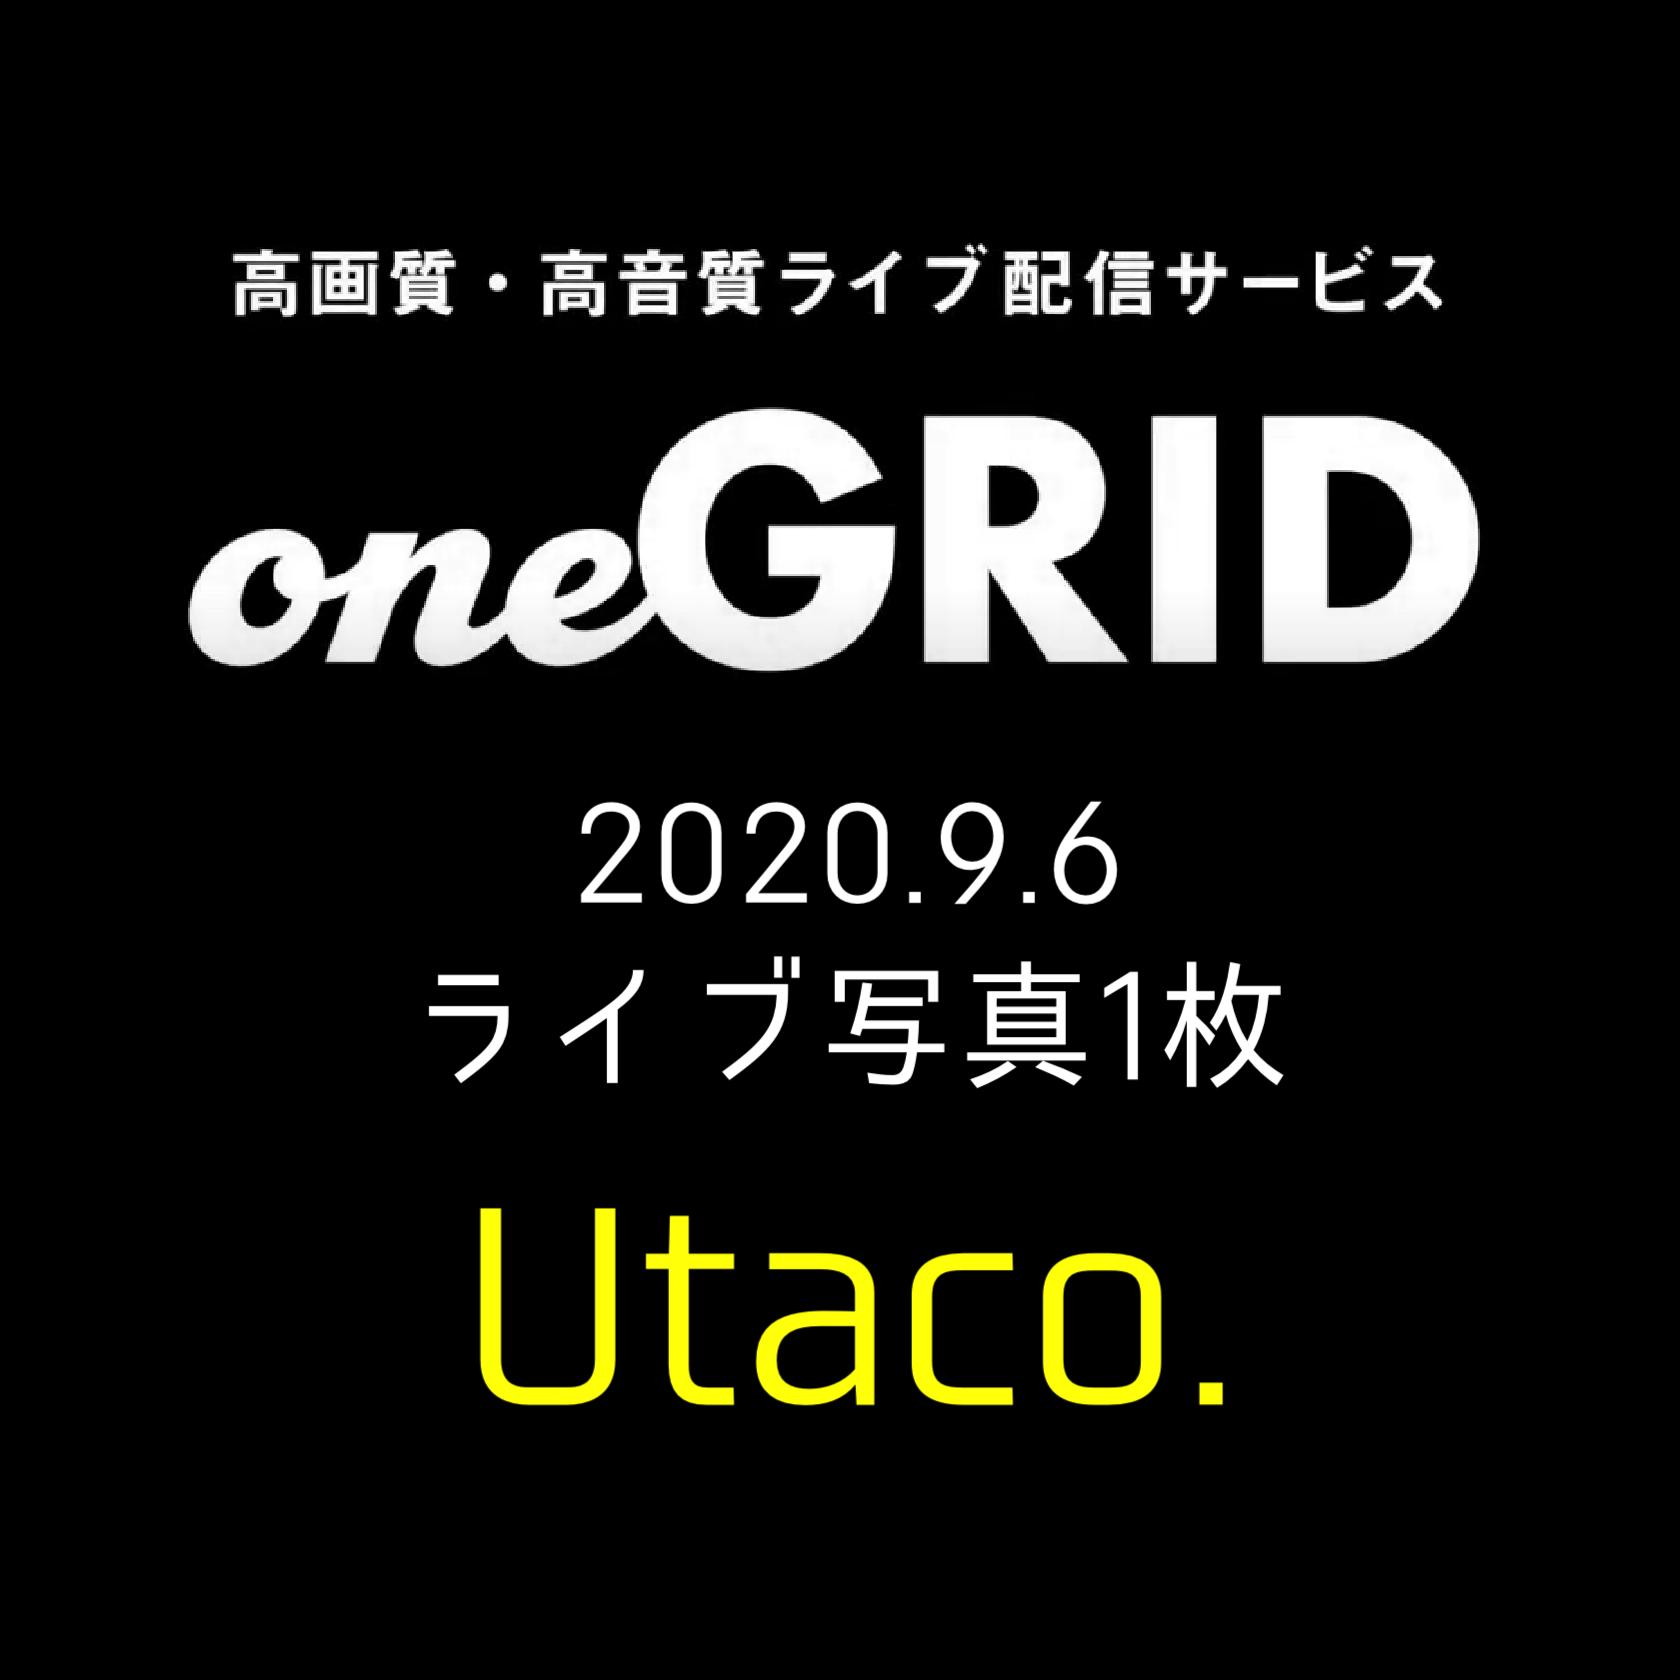 9/6 Utaco. ライブ写真